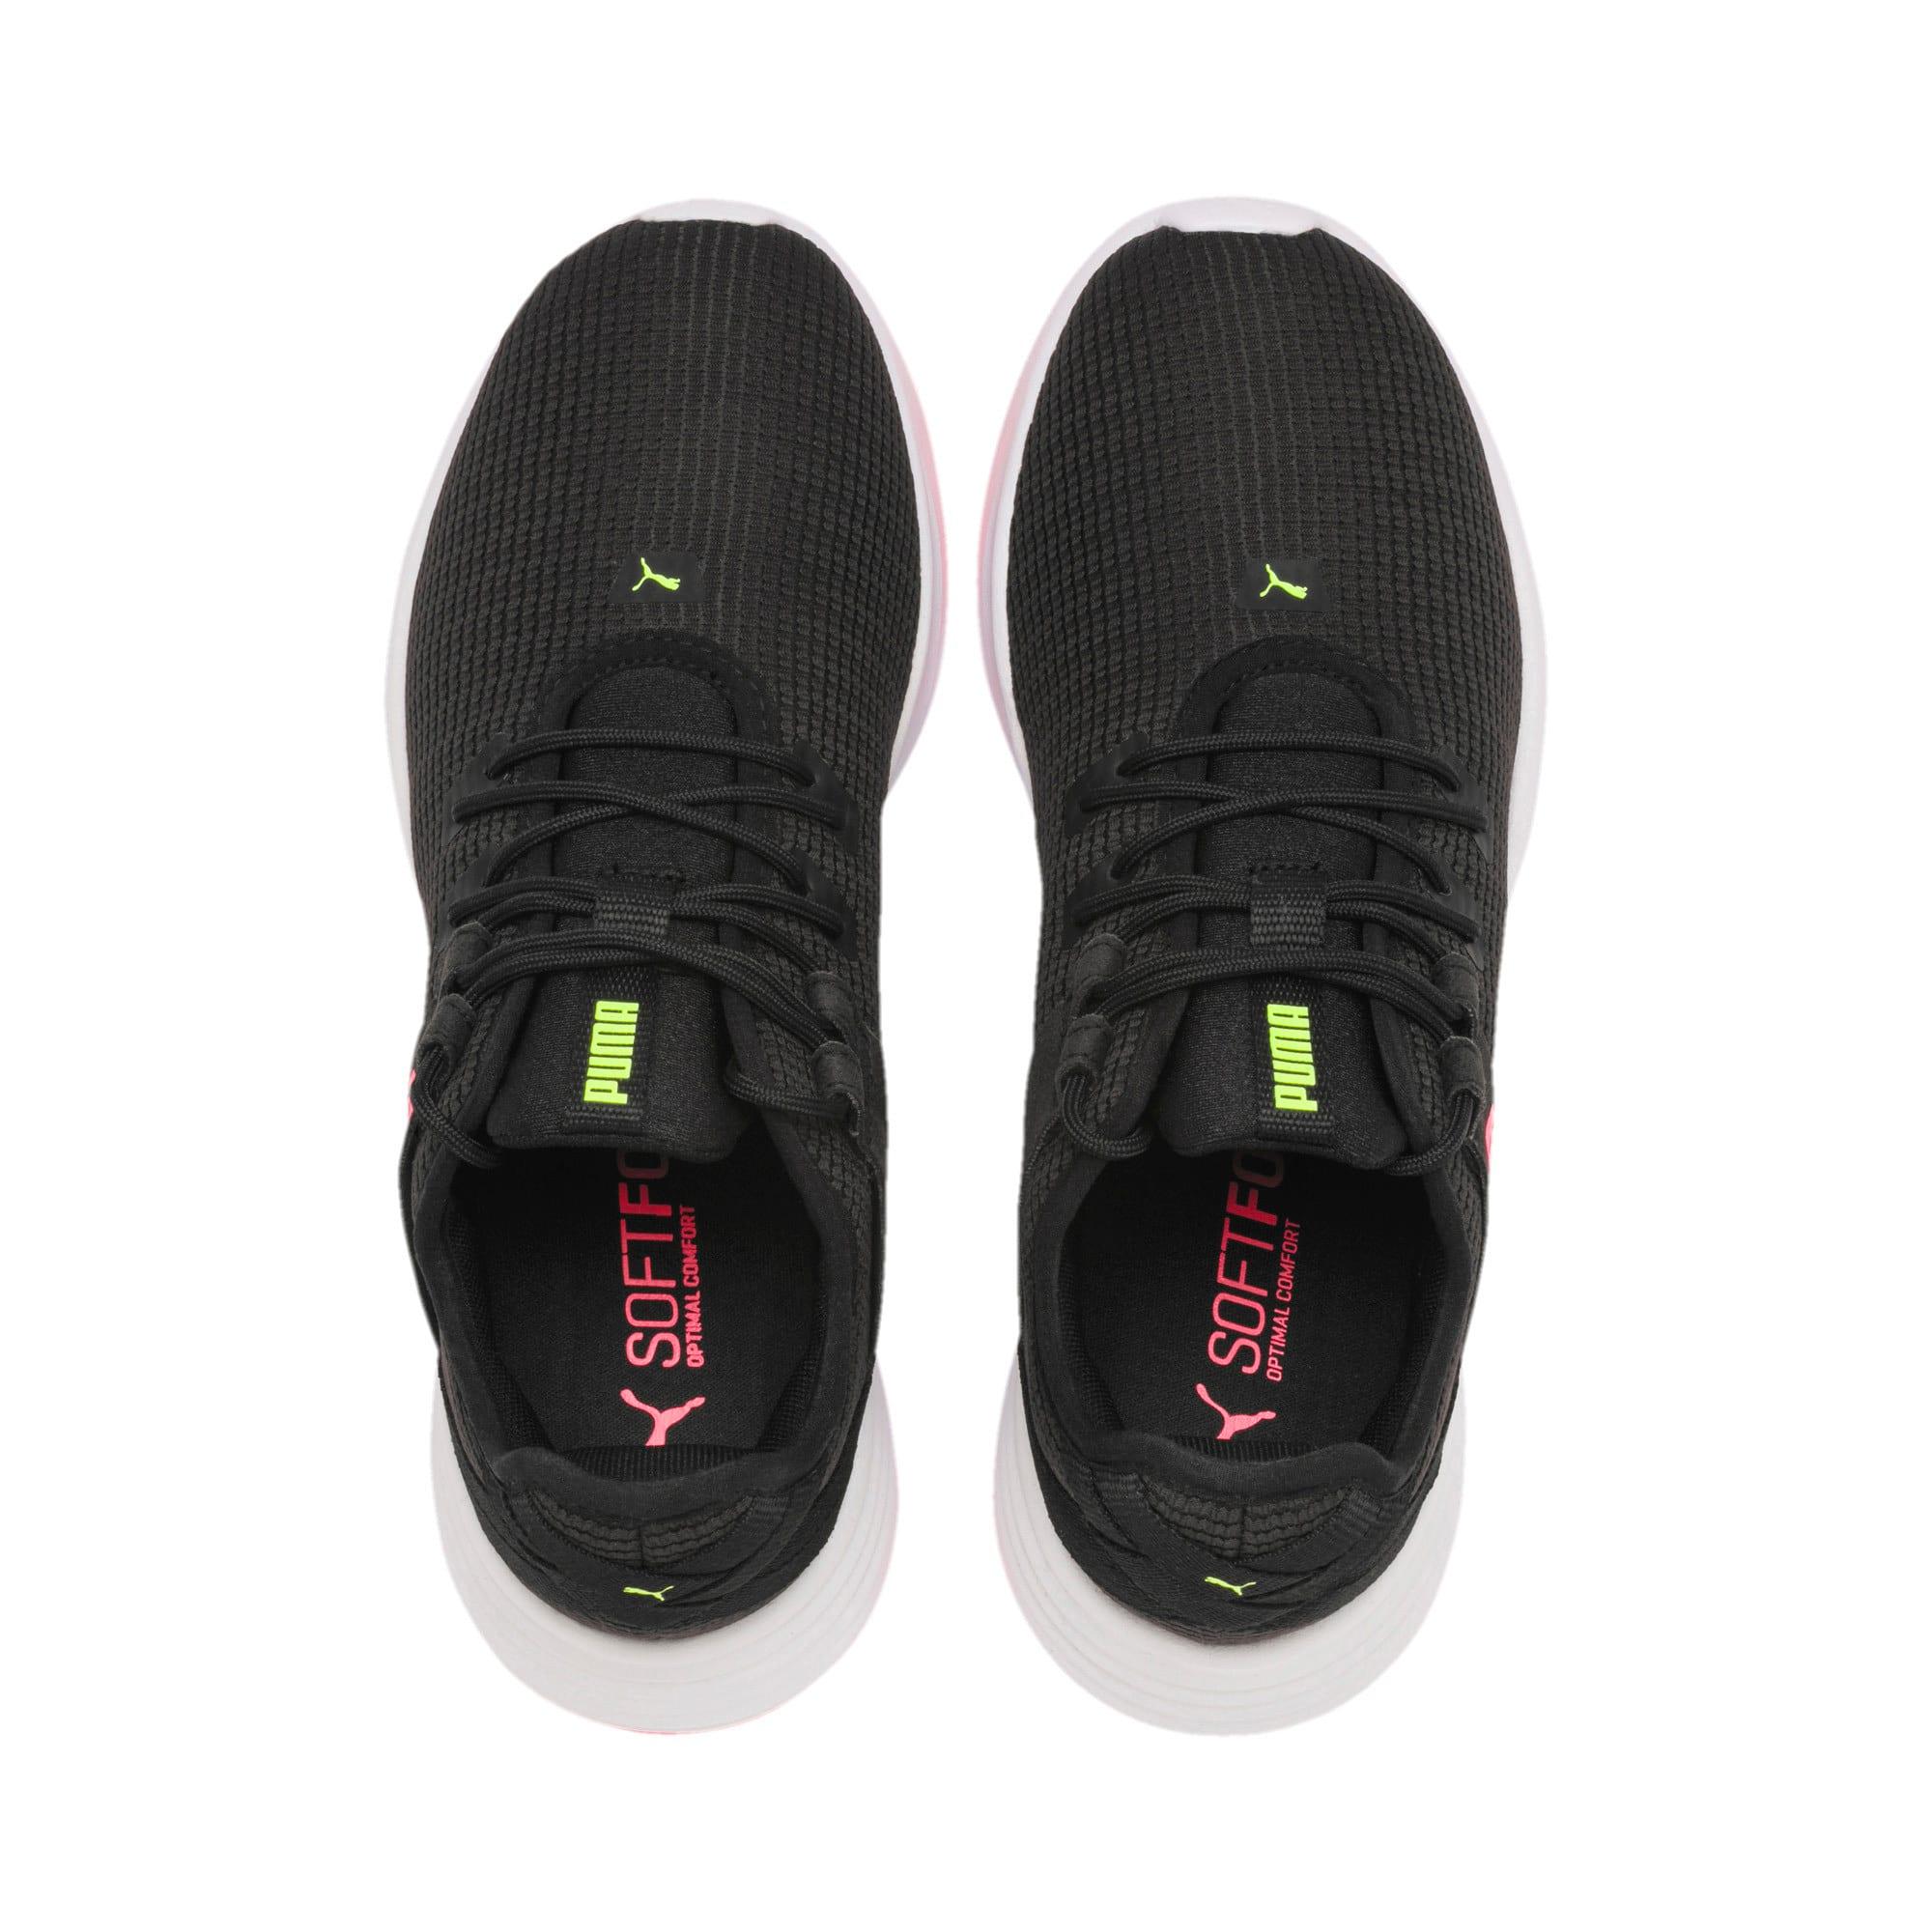 Thumbnail 7 of Radiate XT Women's Training Shoes, Puma Black-Pink Alert, medium